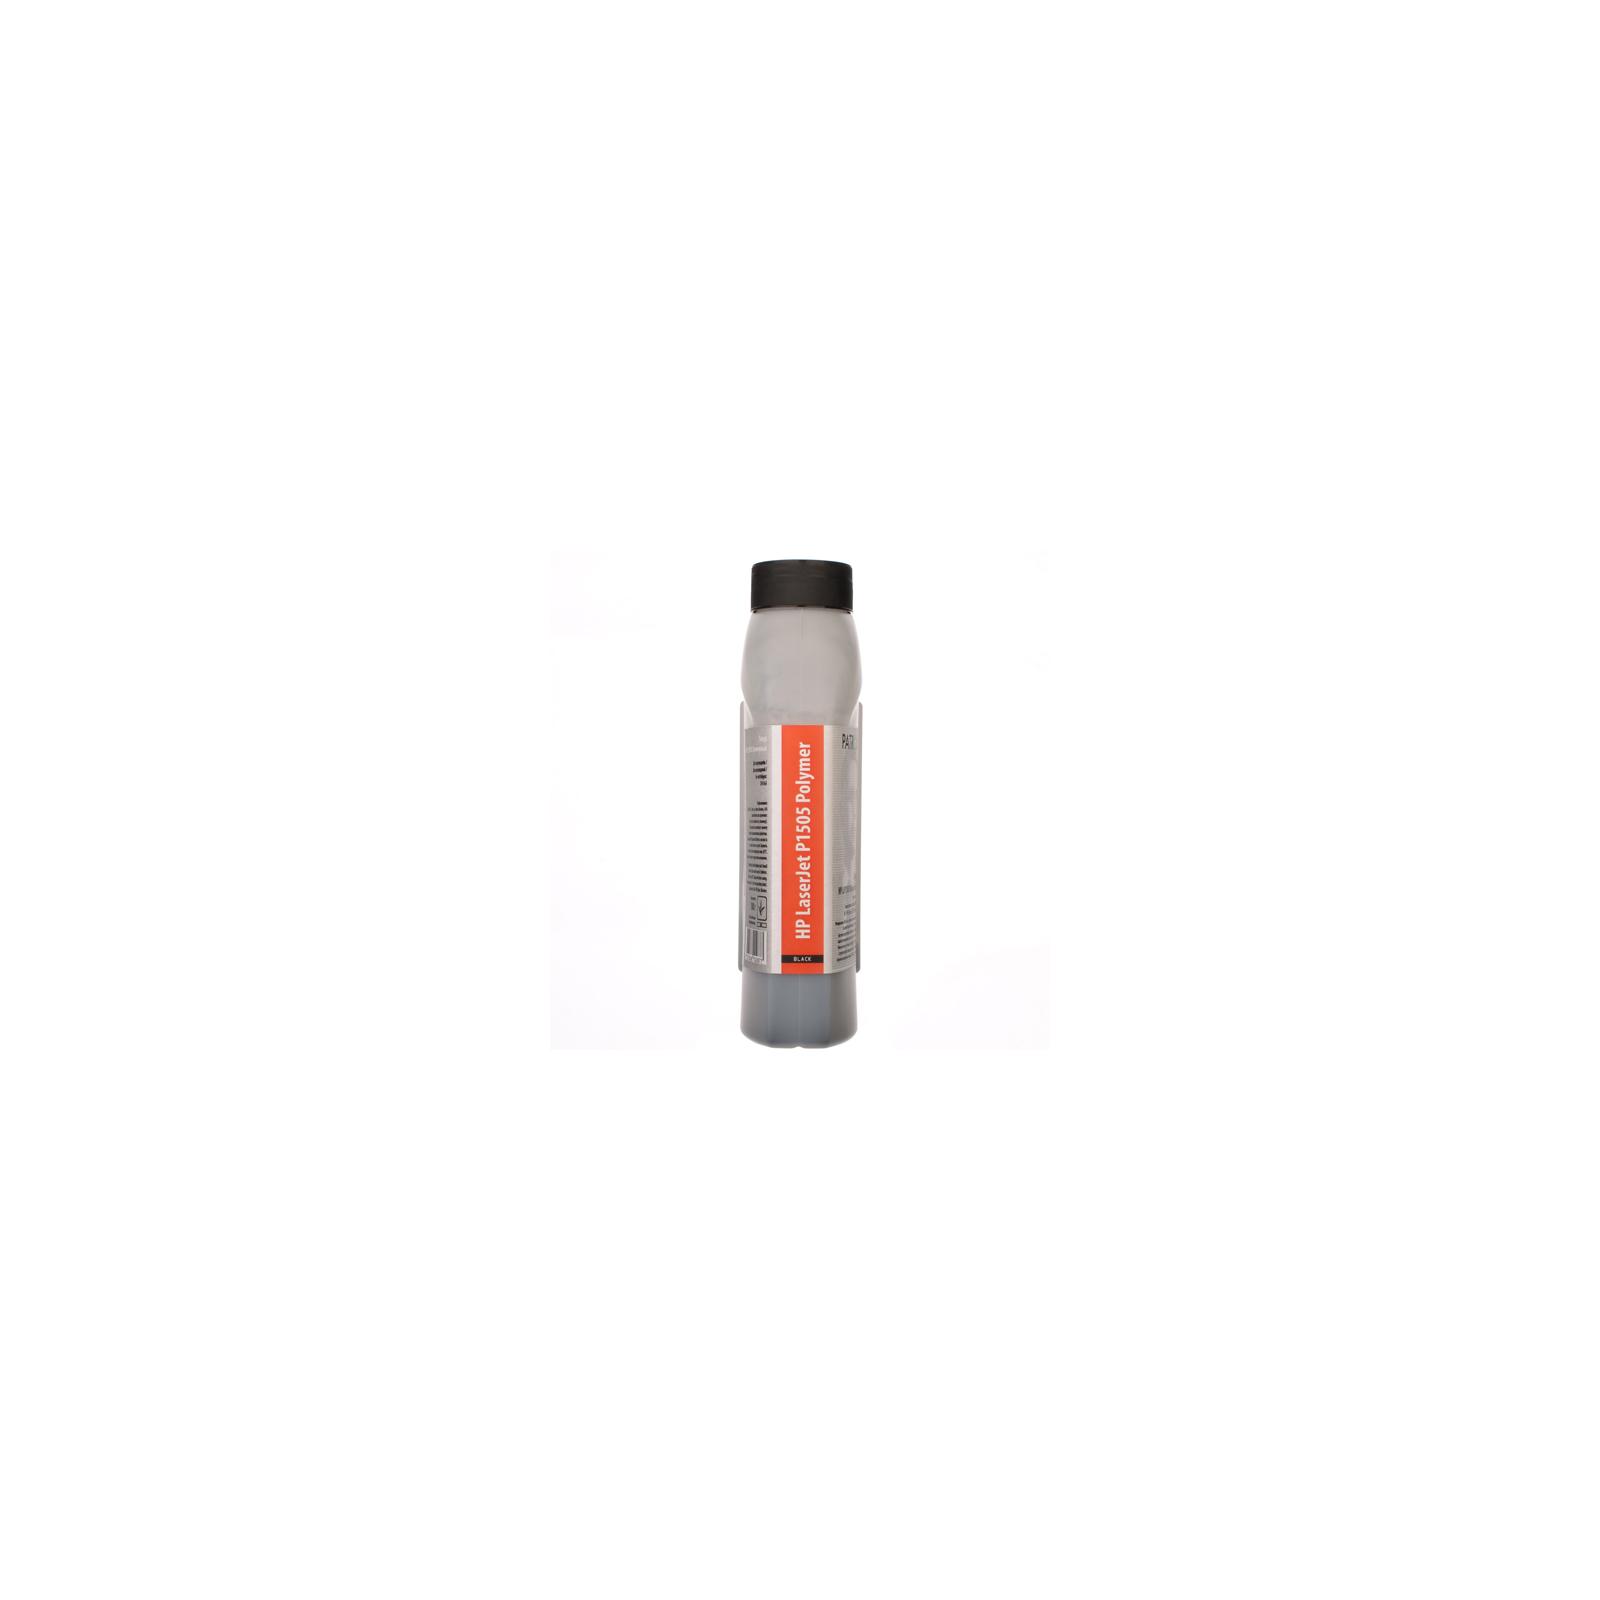 Тонер PATRON HP LJ P1505 Polymer 100г (PN-HLJP1505-P-100) изображение 3